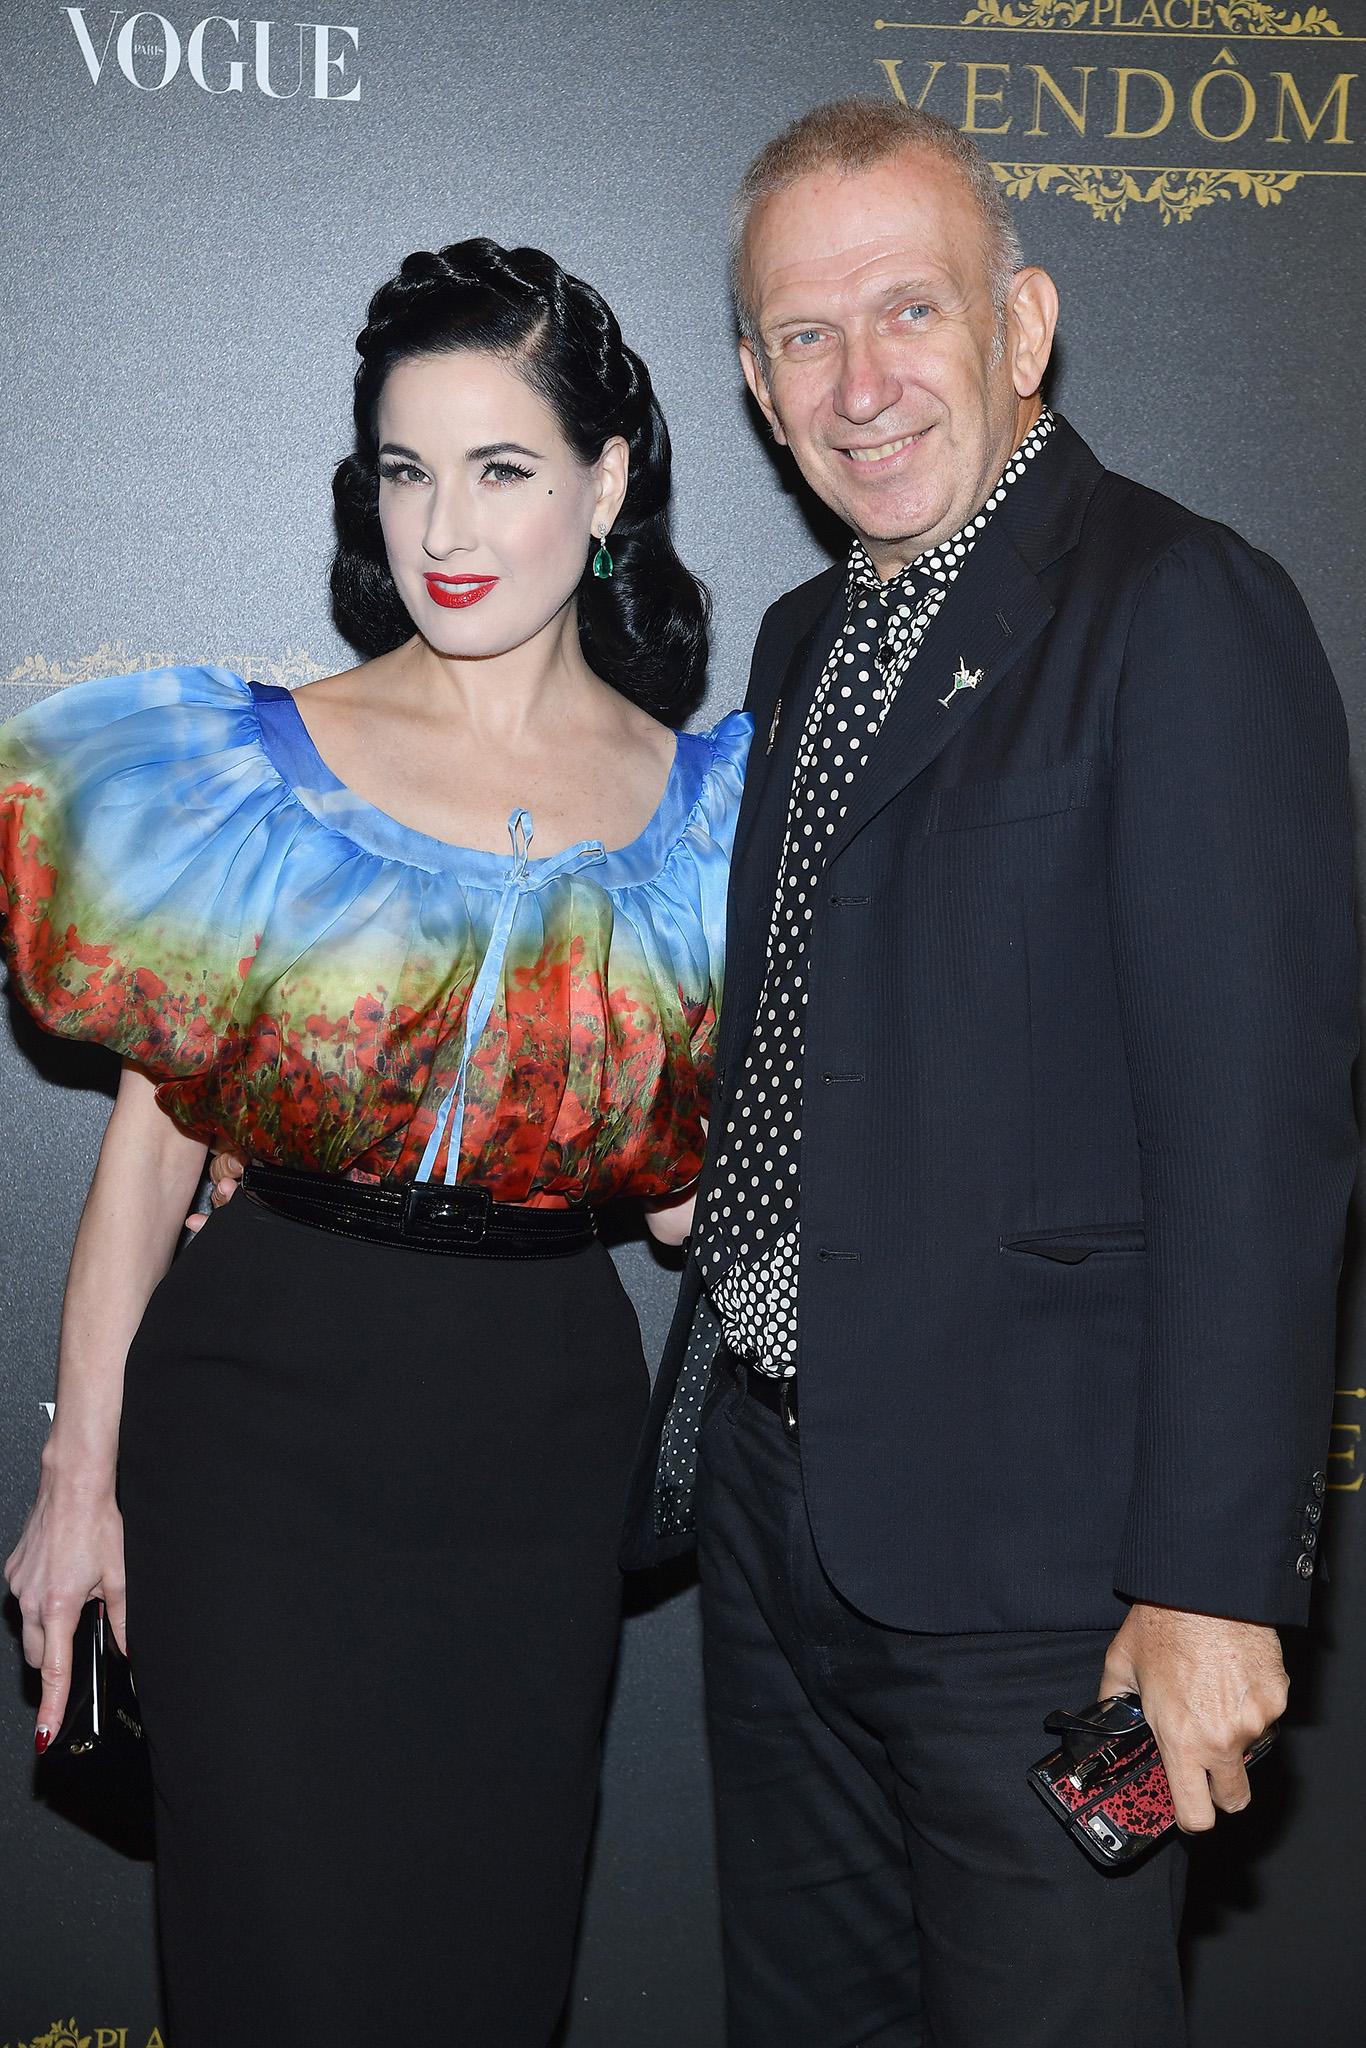 Dita Von Teese and Jean Paul Gaultier